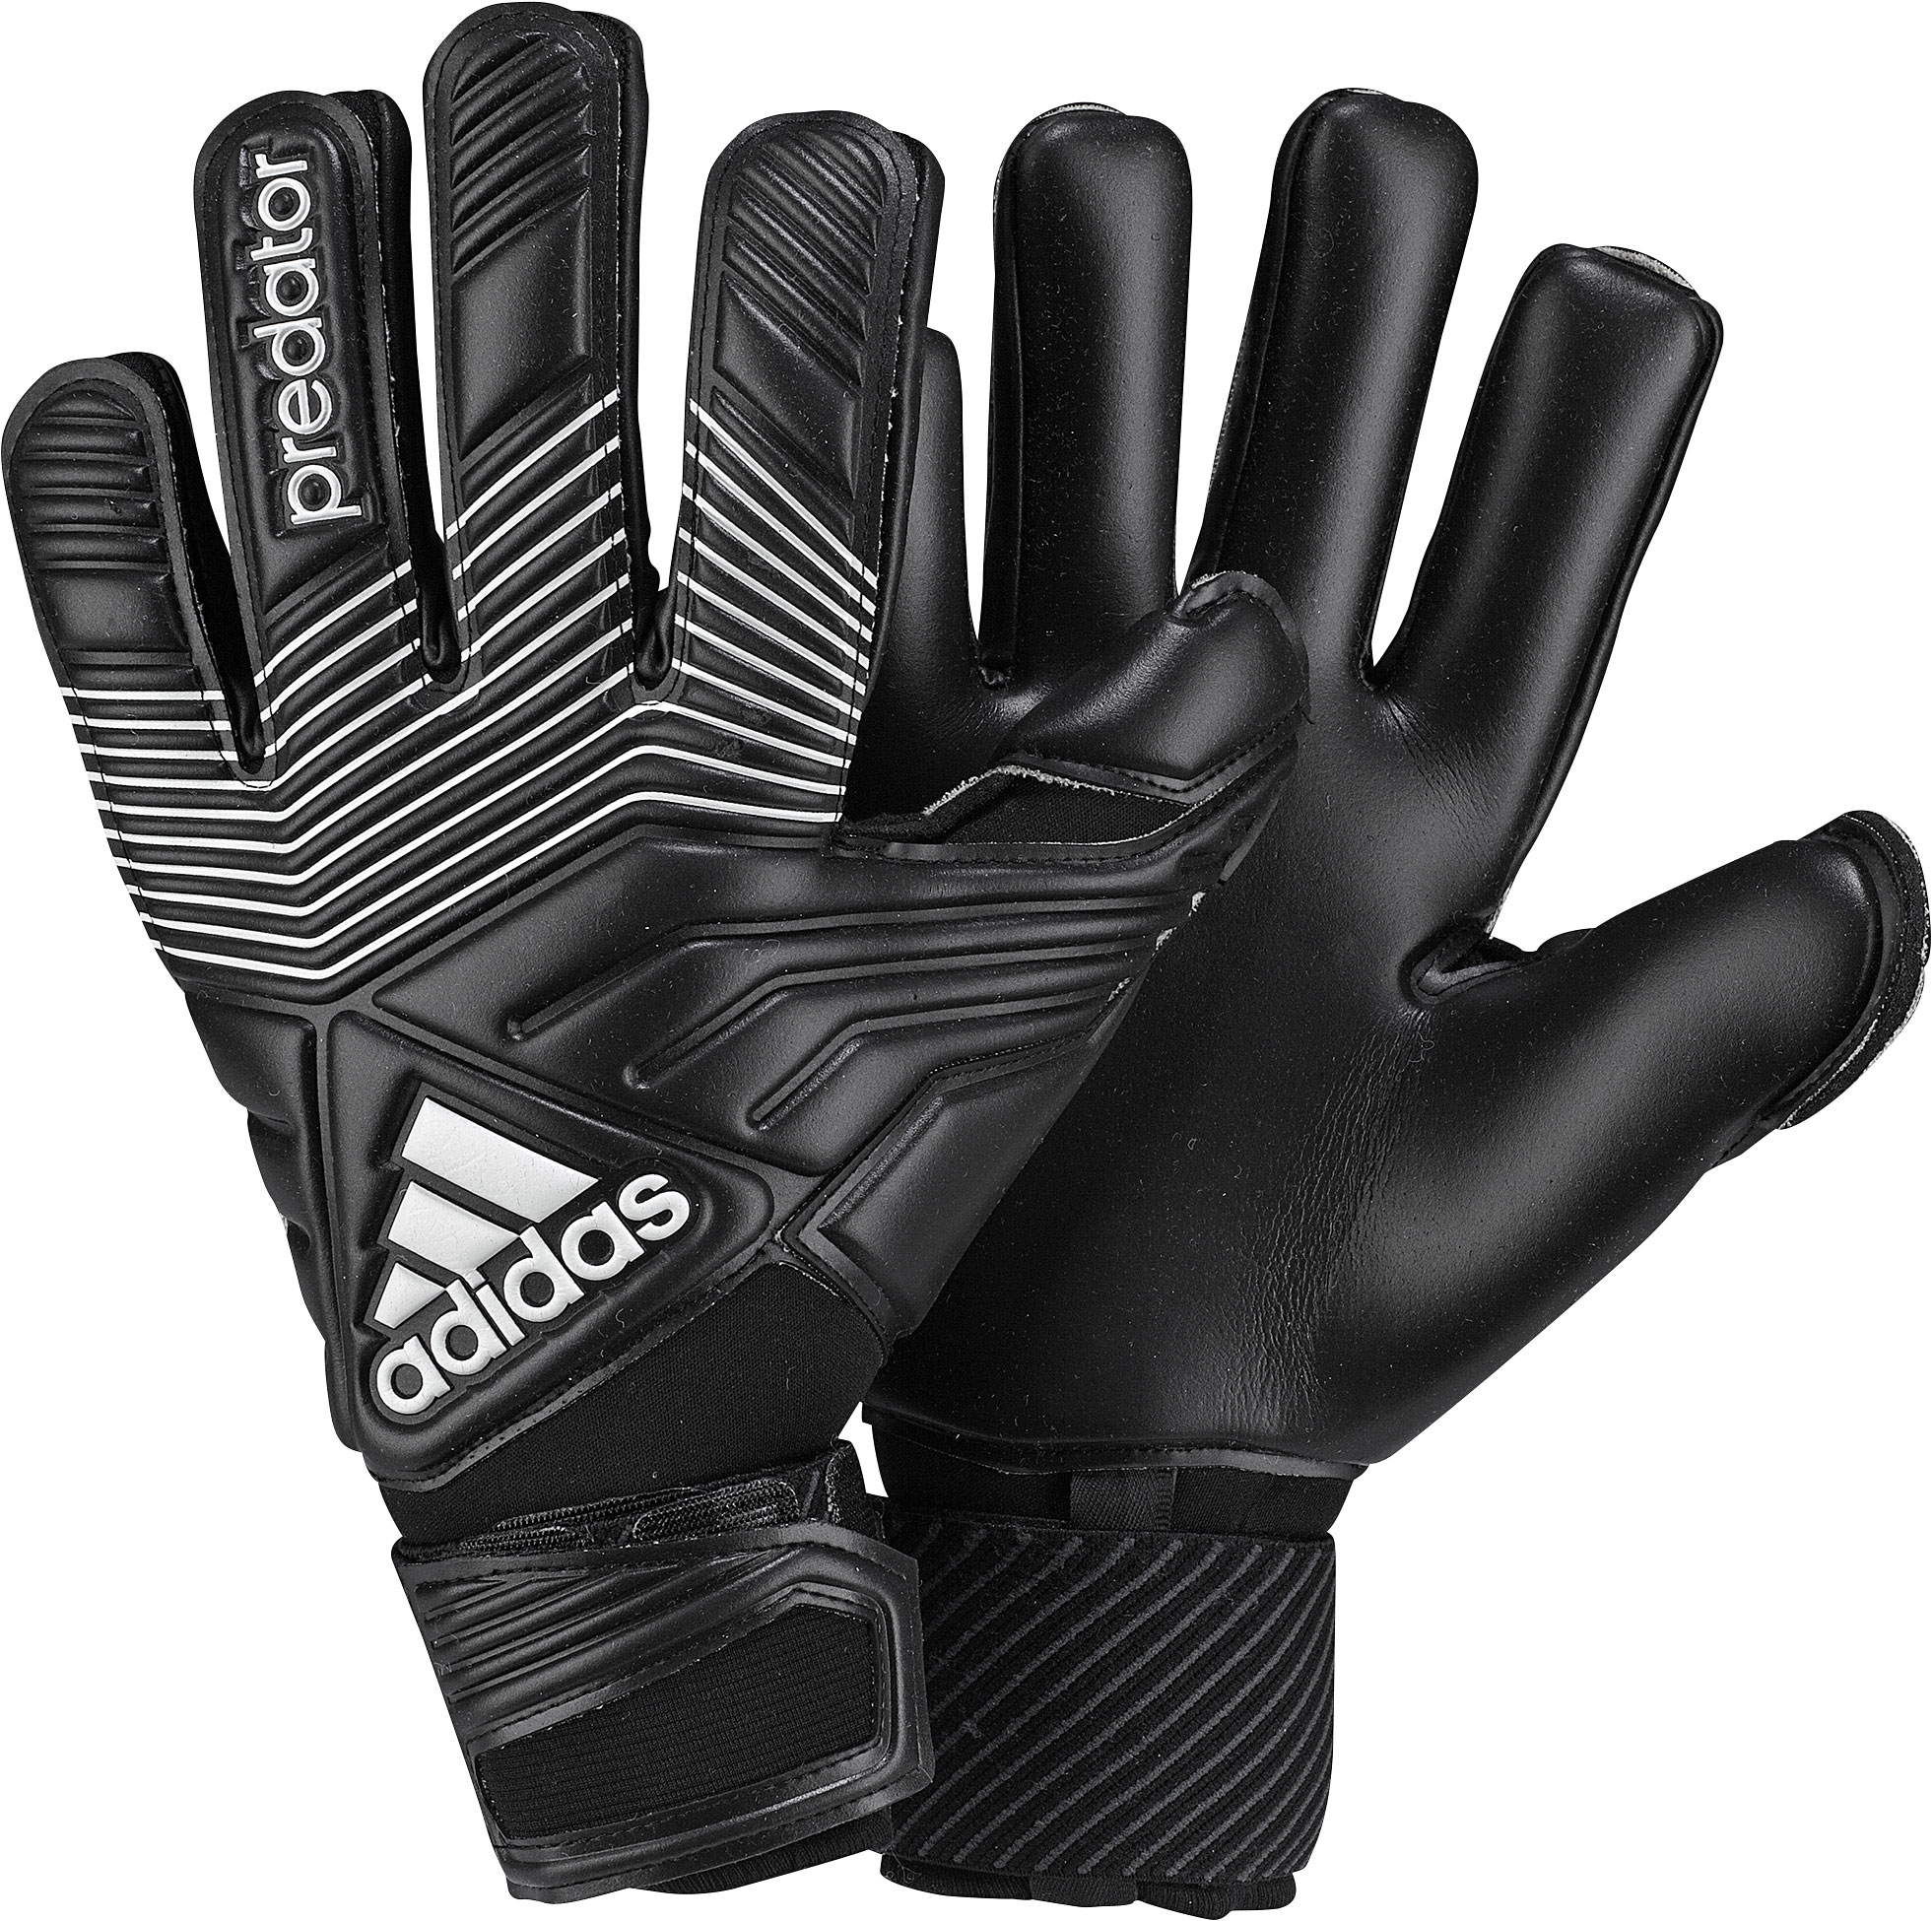 adidas - Goalkeeper Glove Predator Pro Classic Black/White ...